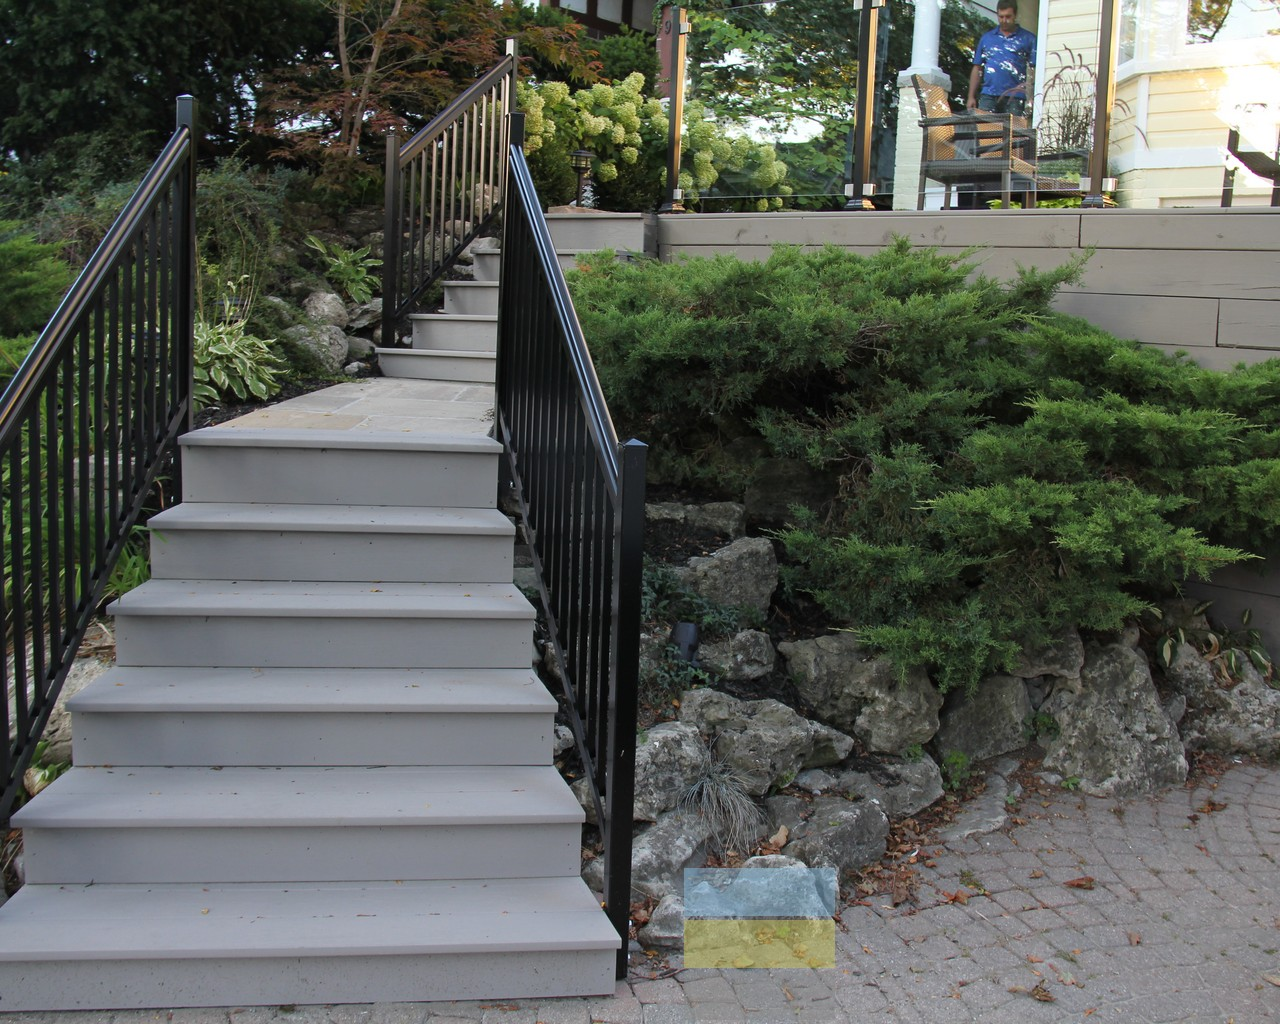 Glass Stair Railings Interior: Aluminium Stair Railings With Glass